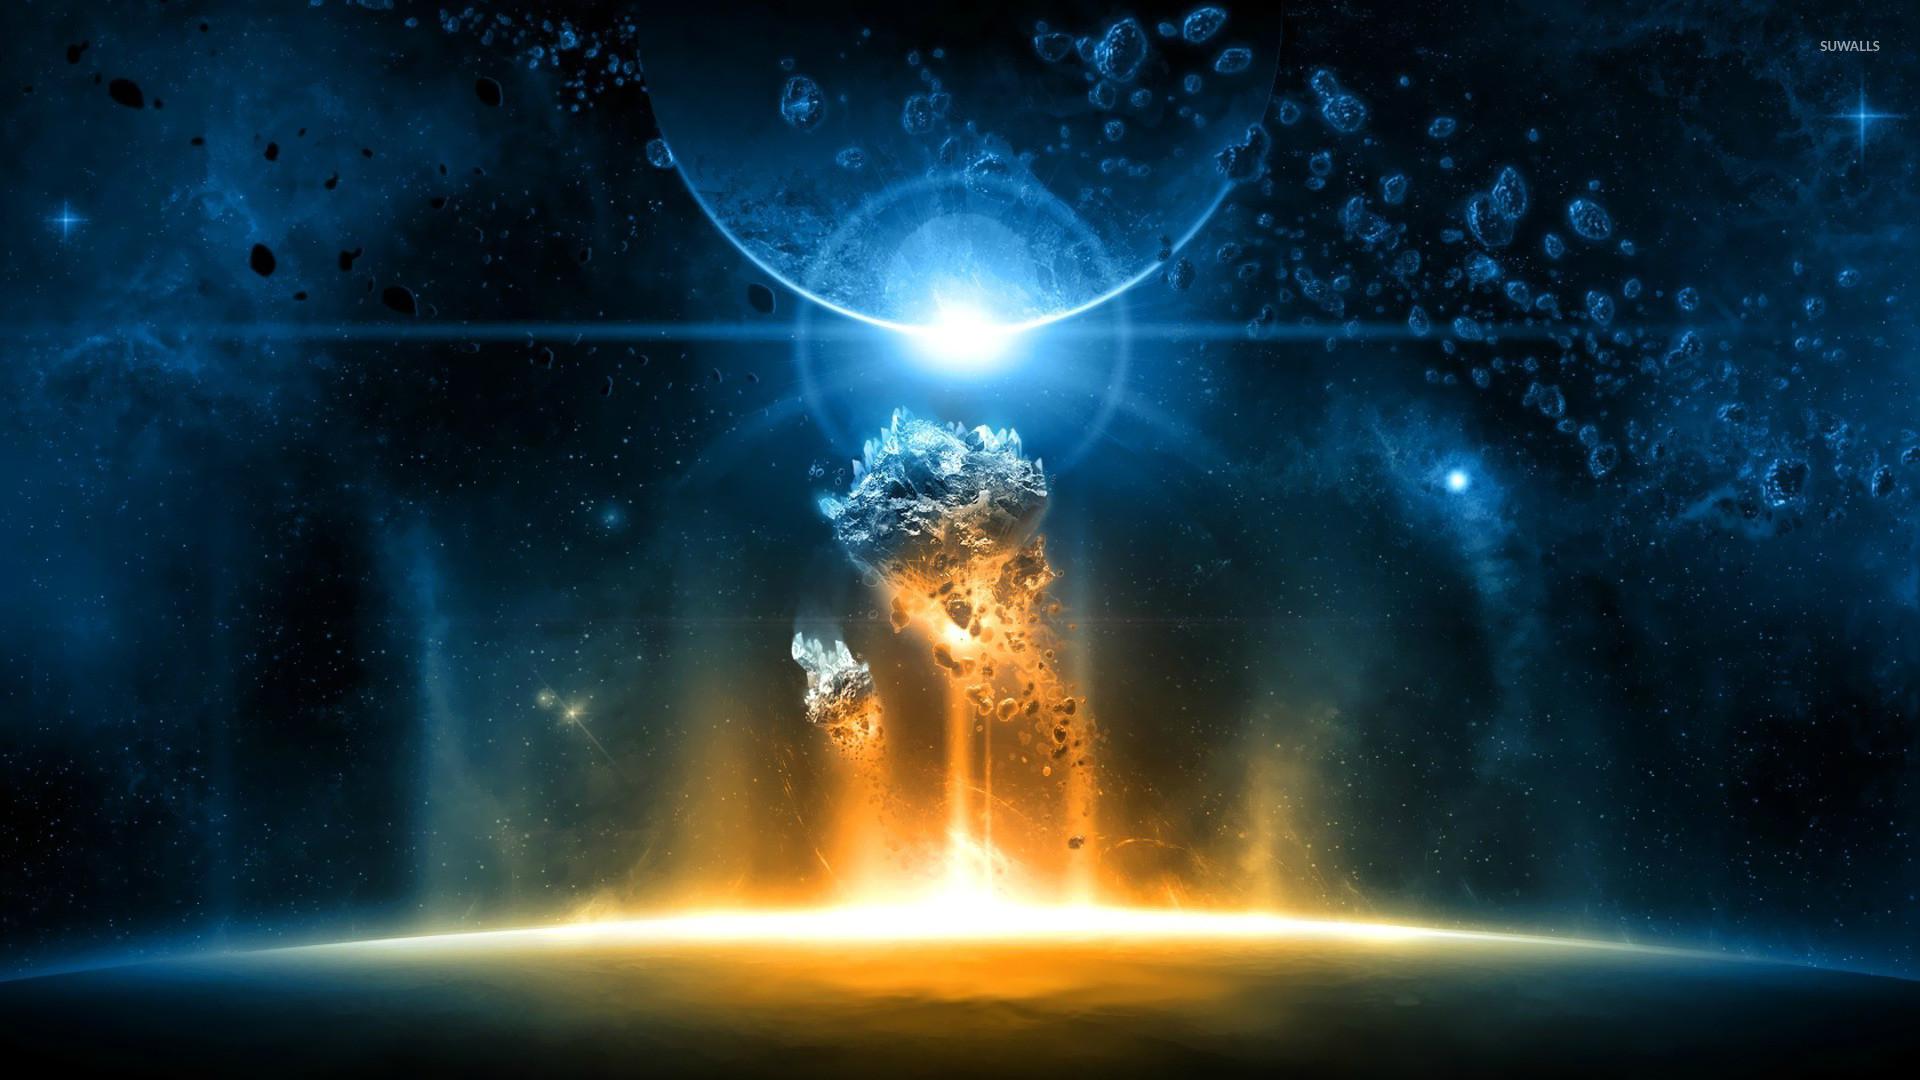 Planets & Asteroids wallpaper jpg